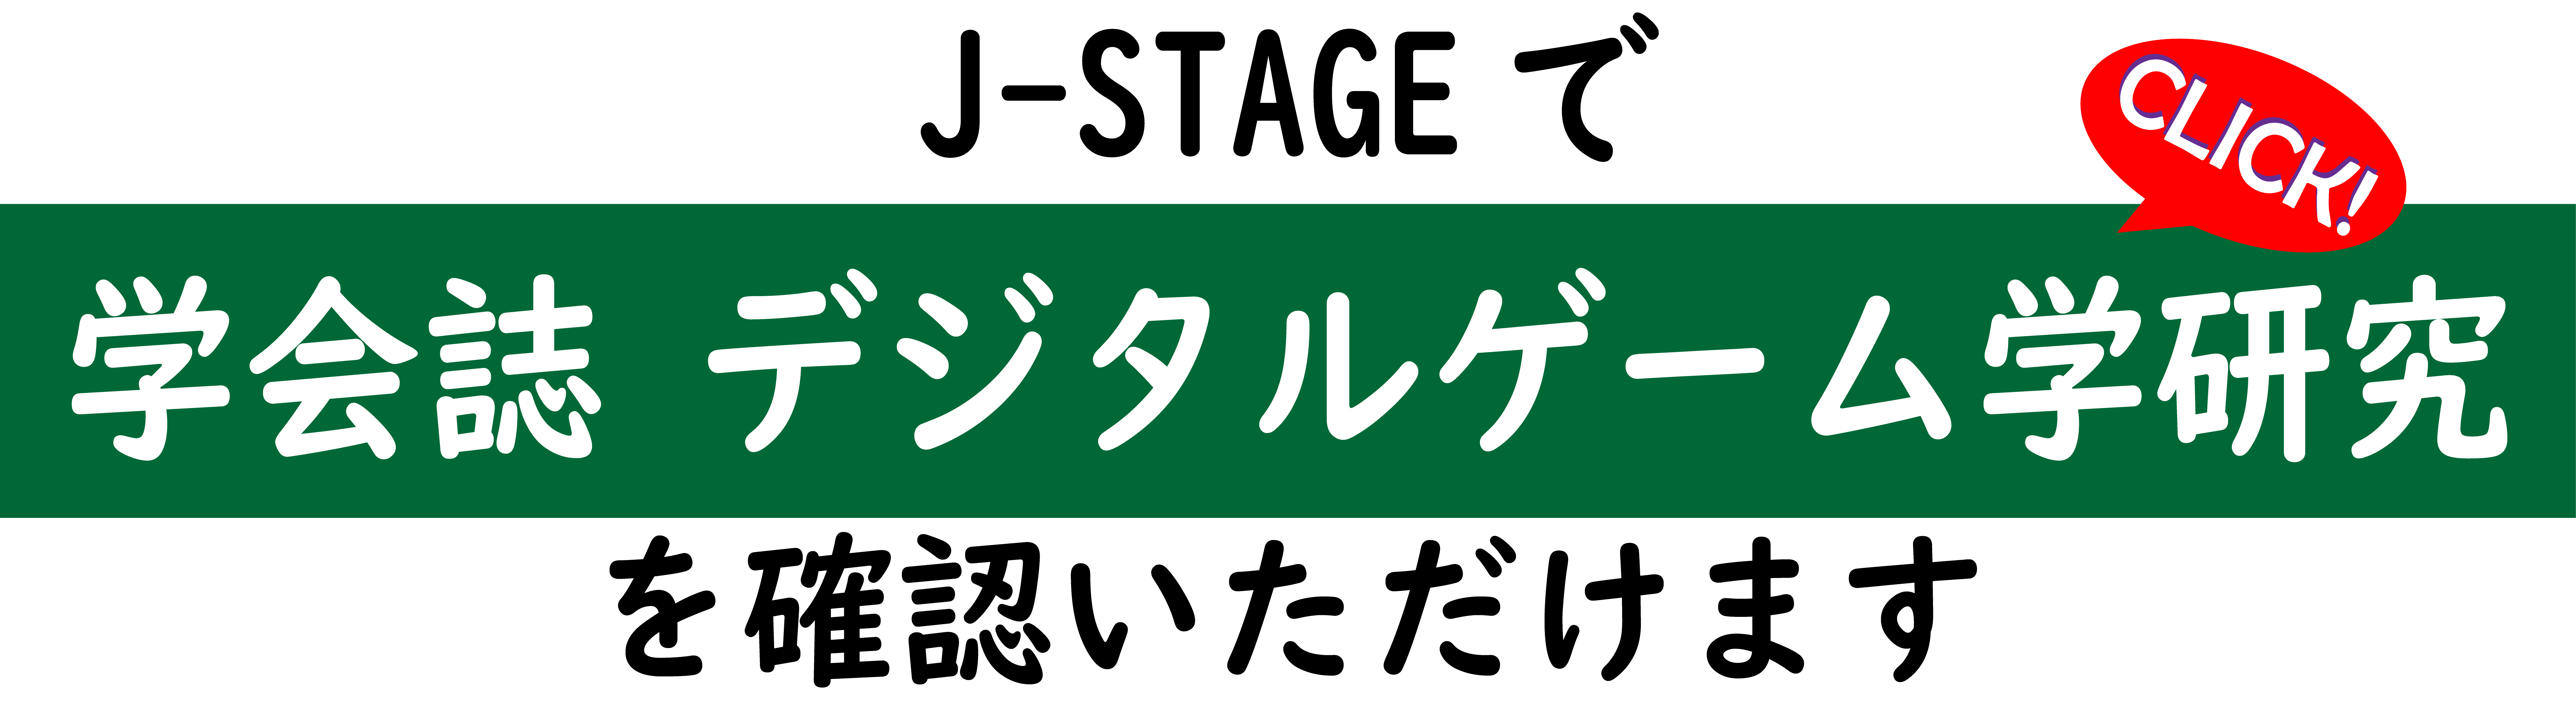 j-stageで論文誌を確認いただけます